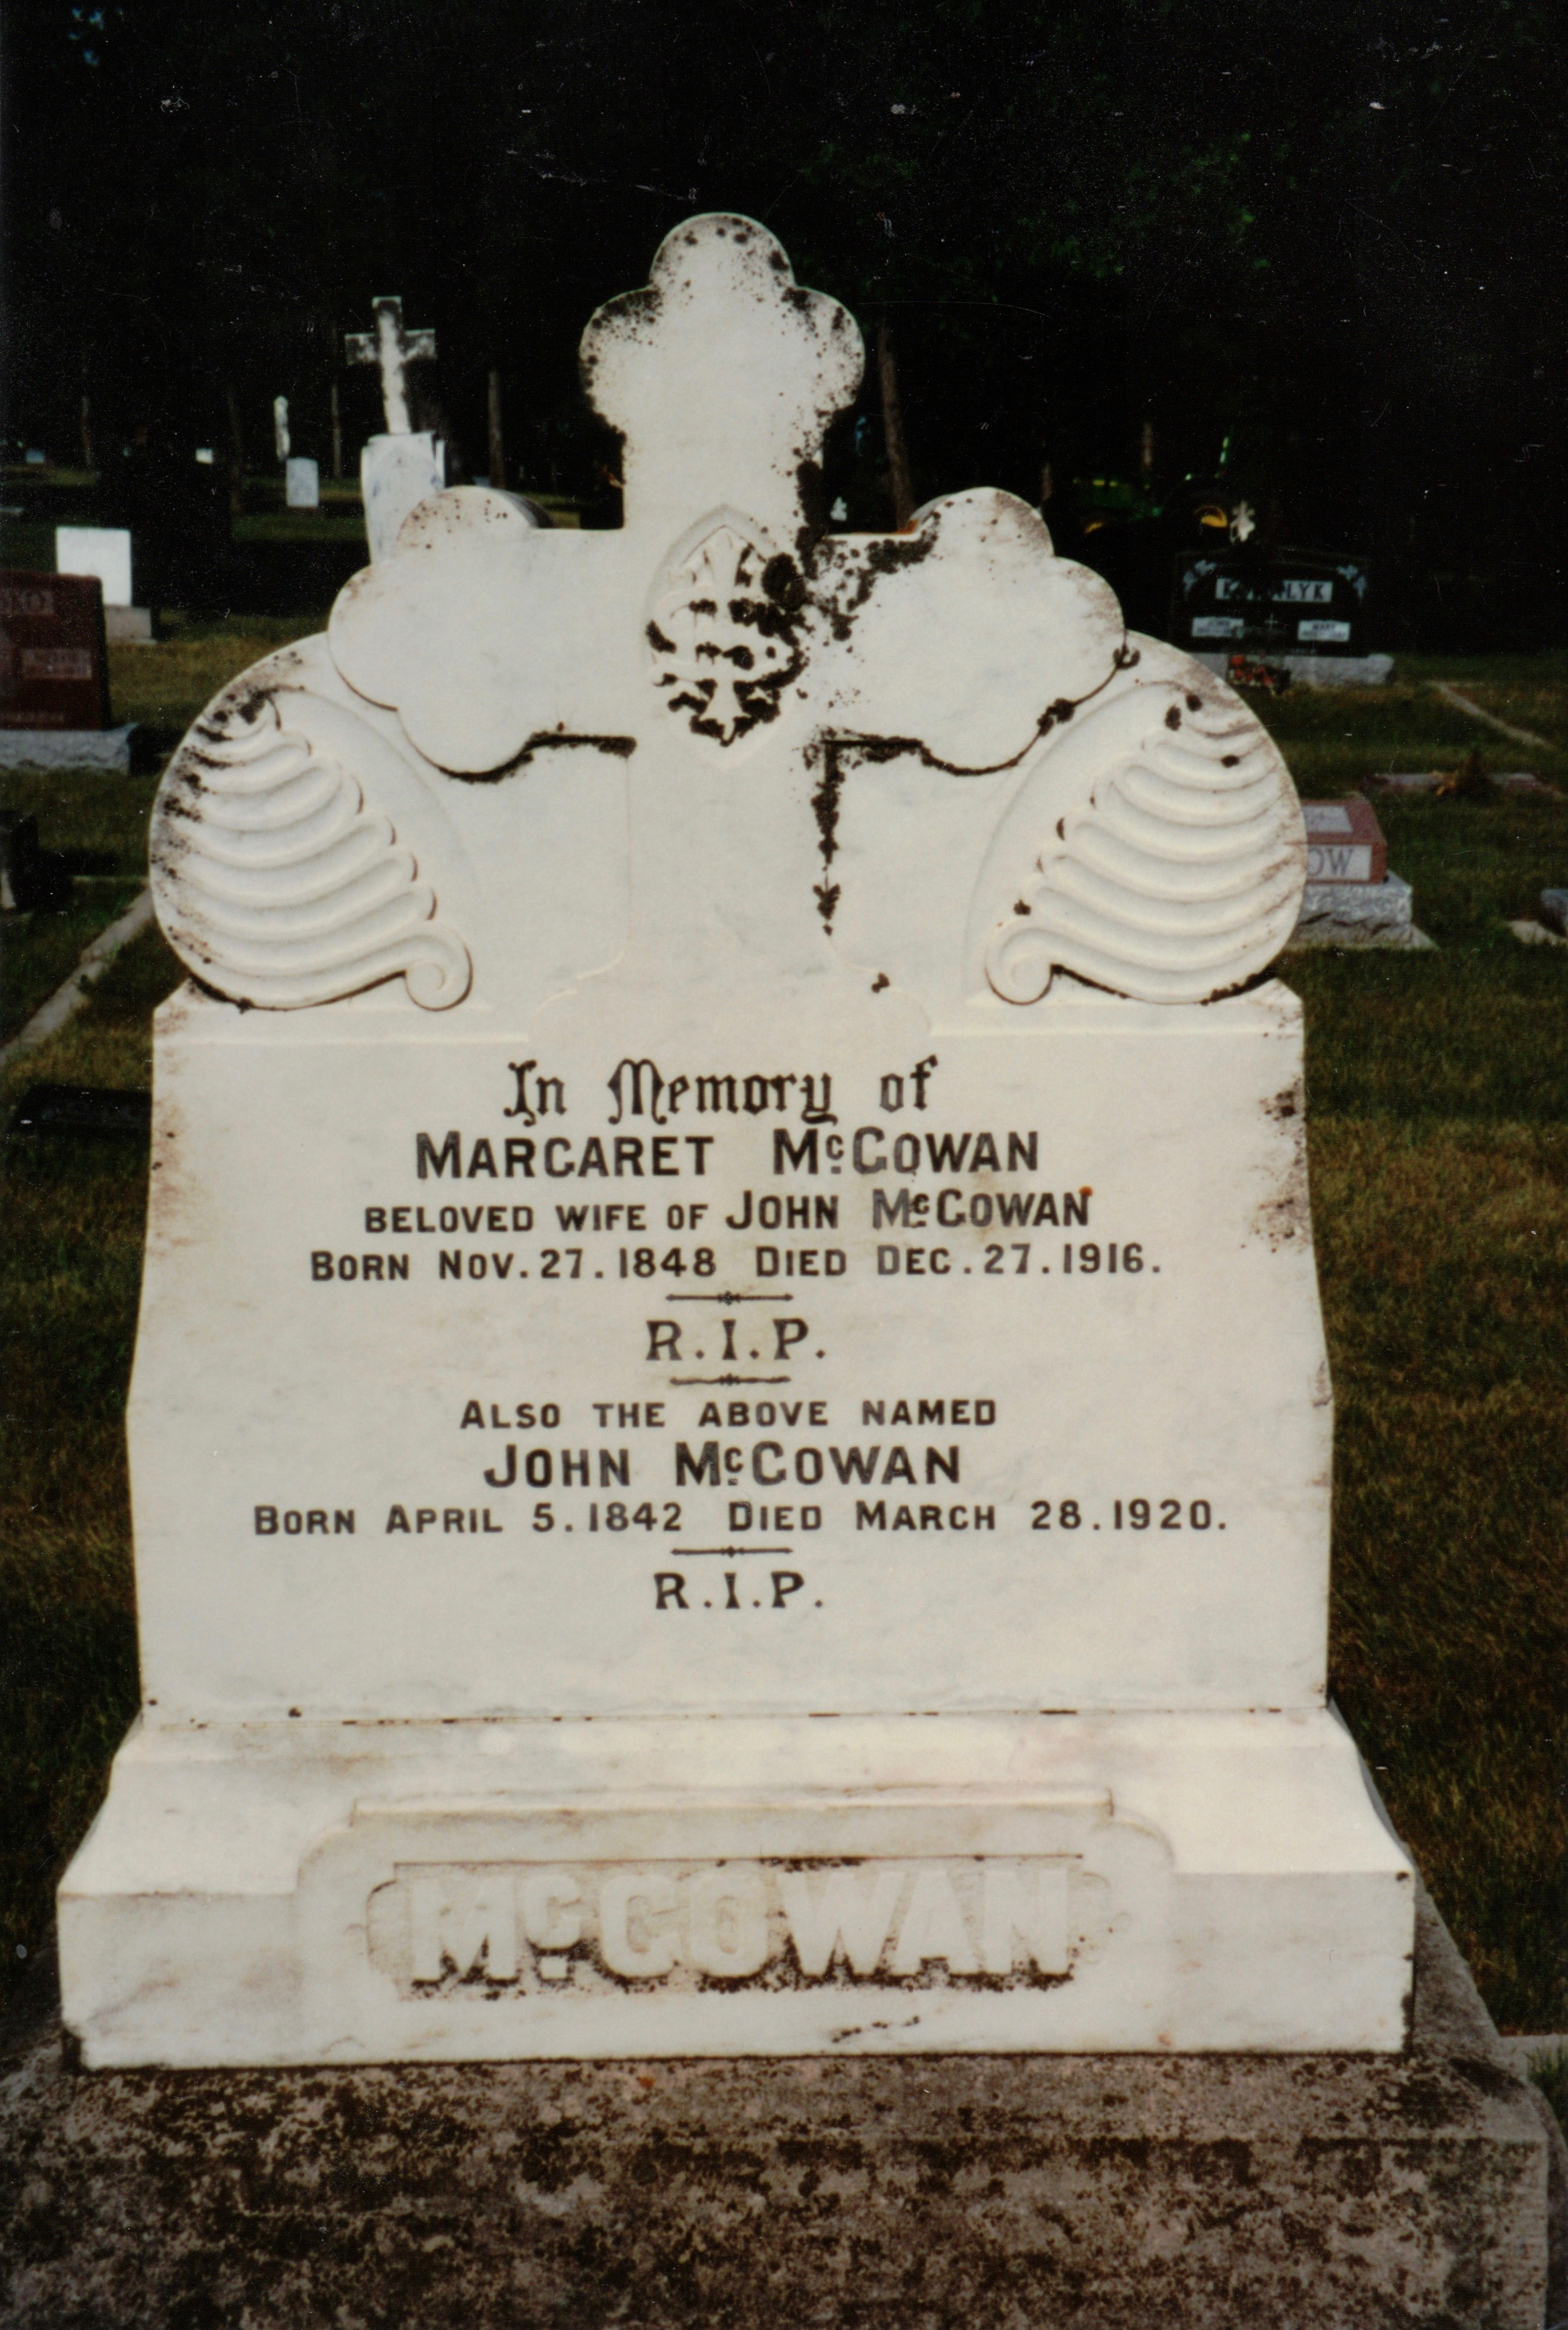 McGowan stone, King Cemetery